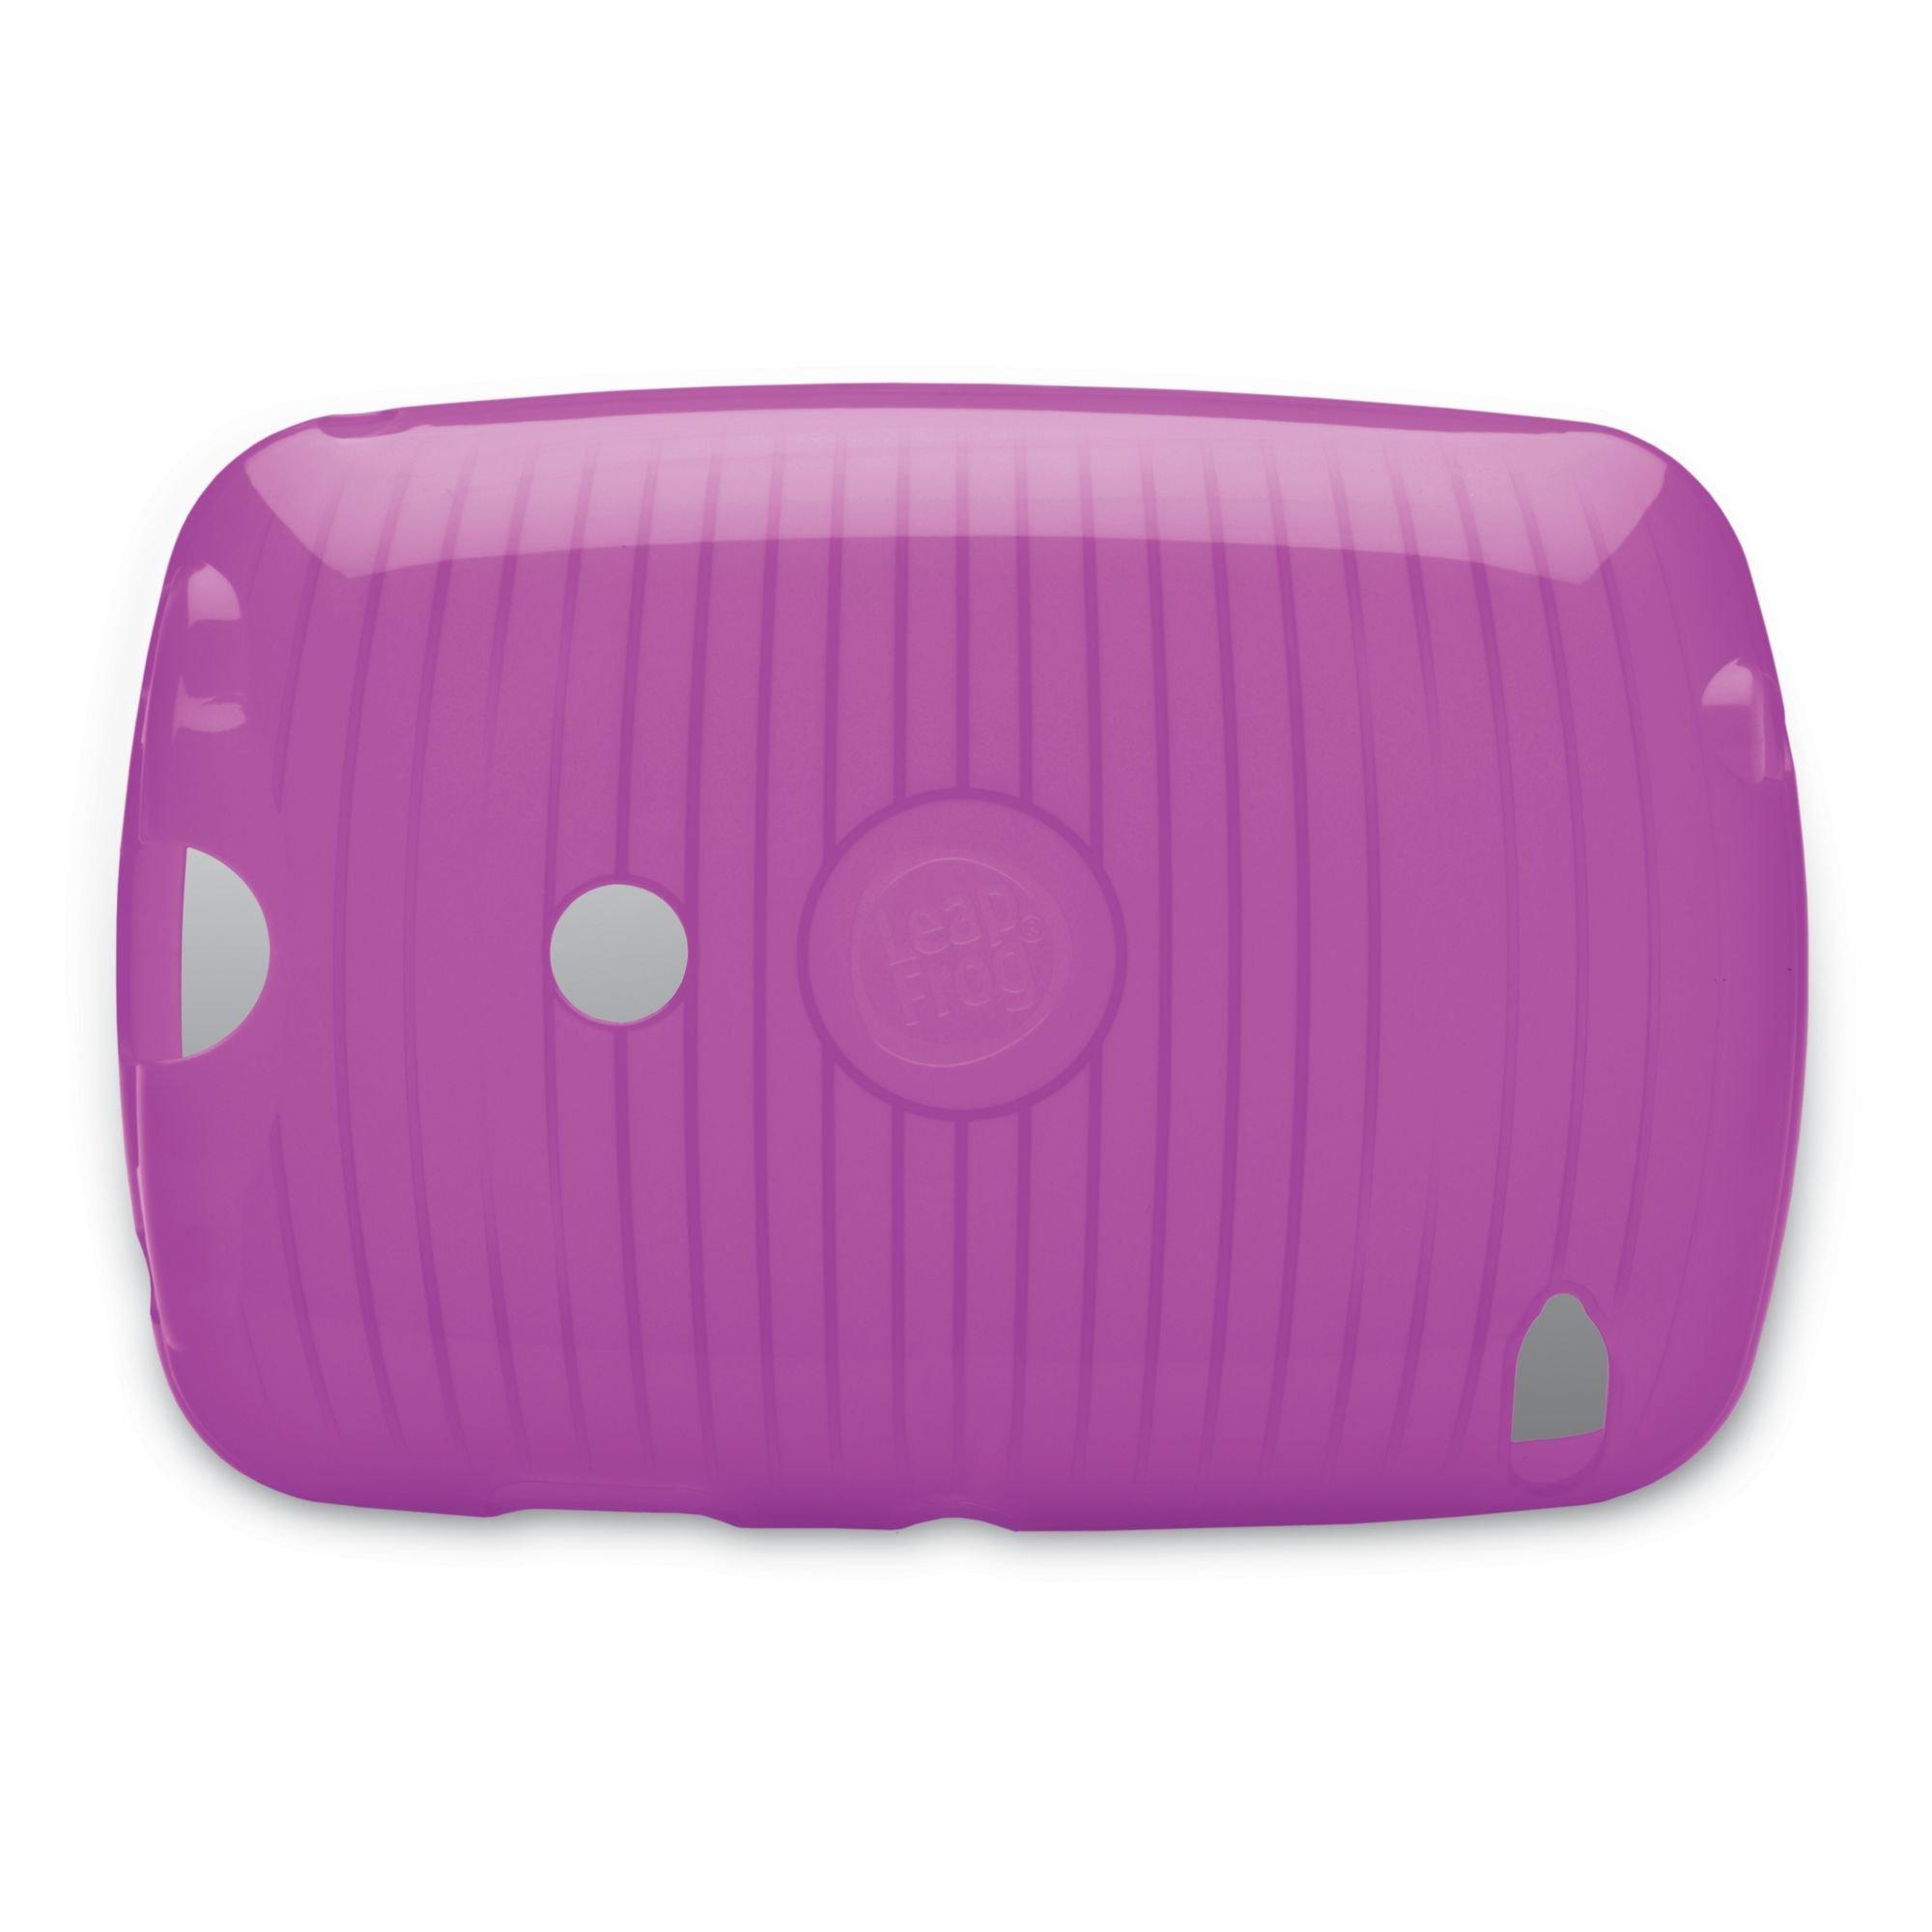 LeapFrog LeapPad3 Gel Skin, Purple (made to fit LeapPad3)